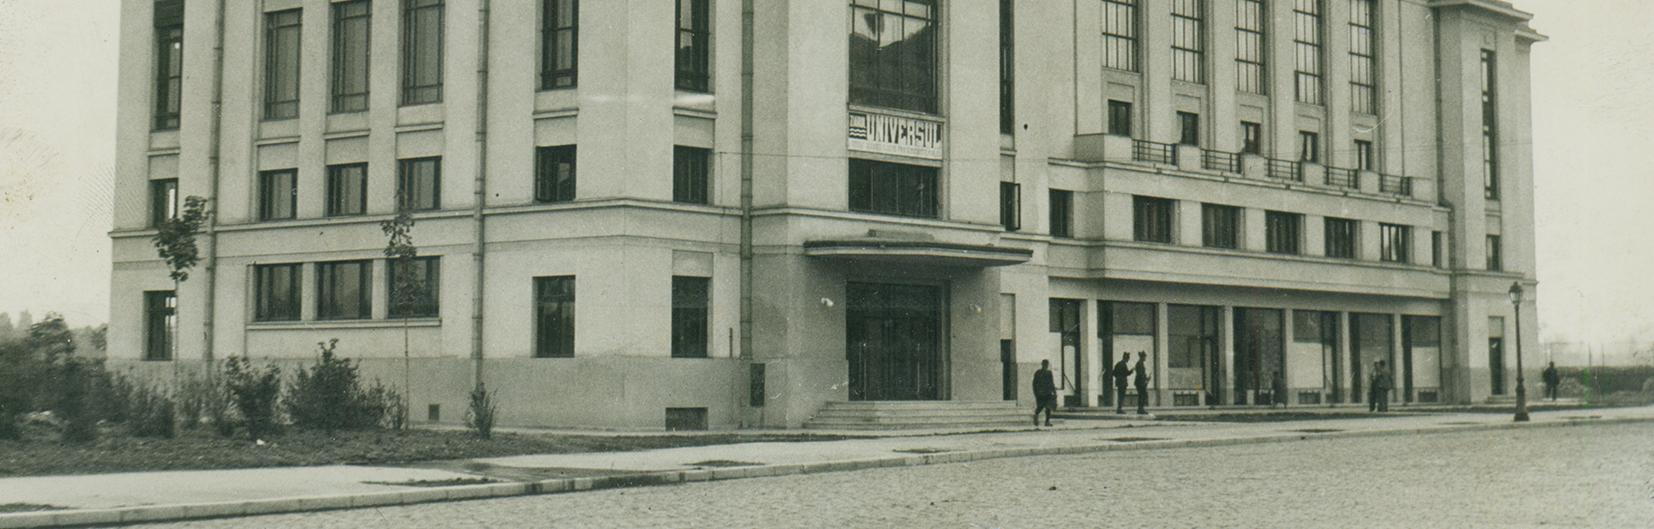 Casa de cultura a studentilor Grigore Preoteasa cartier cotroceni, Bucuresti foto perioada interbelica poze vechi cover